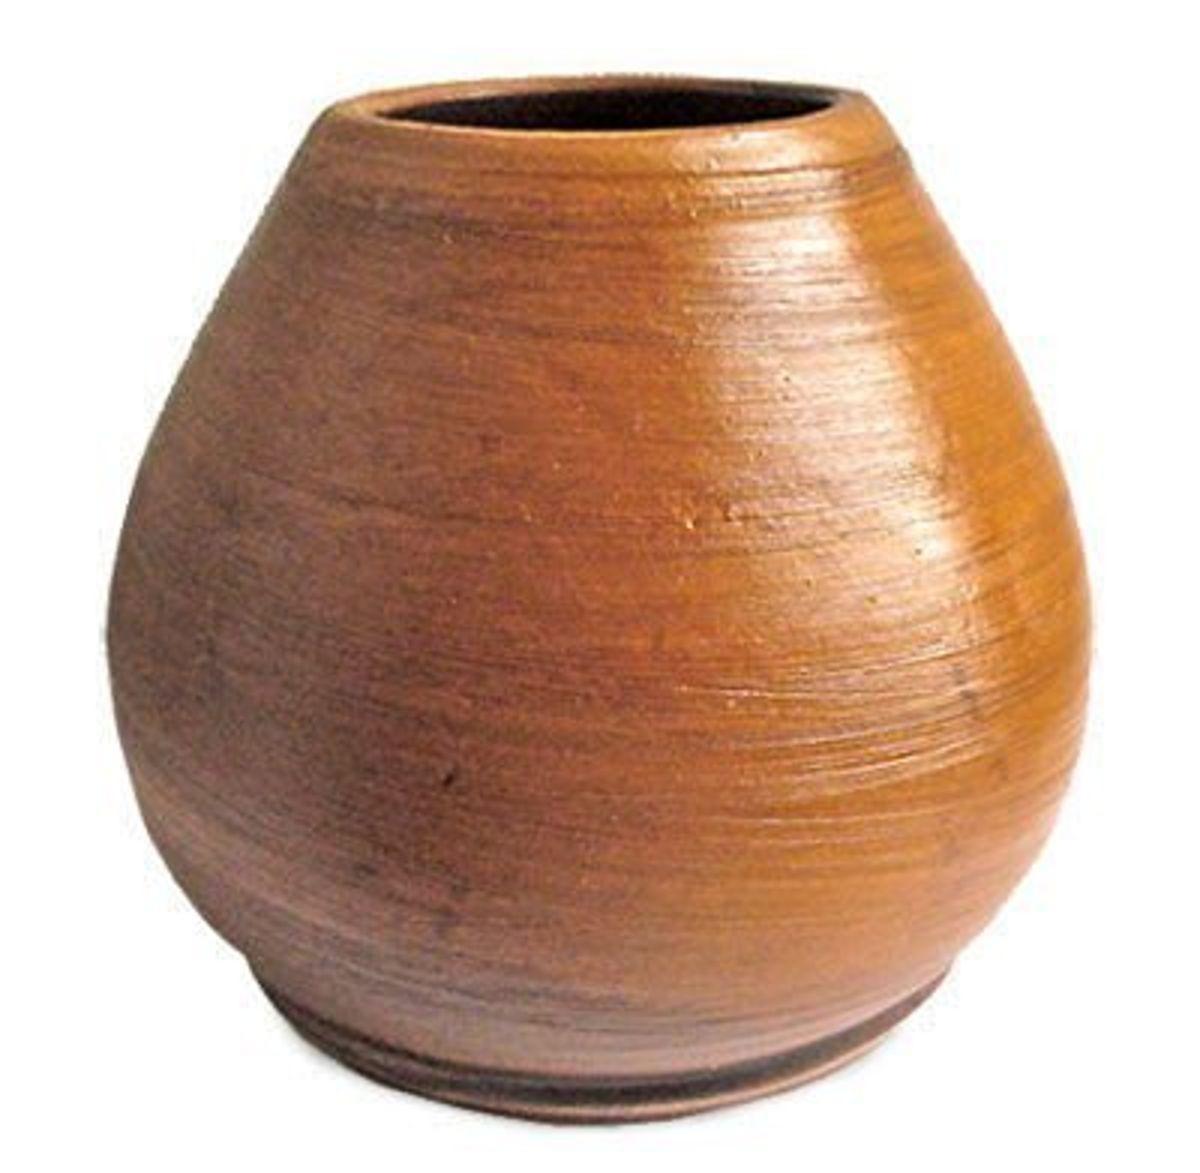 mate tee set mate becher aus keramik 2x 50g matetee catuava goji guarana. Black Bedroom Furniture Sets. Home Design Ideas